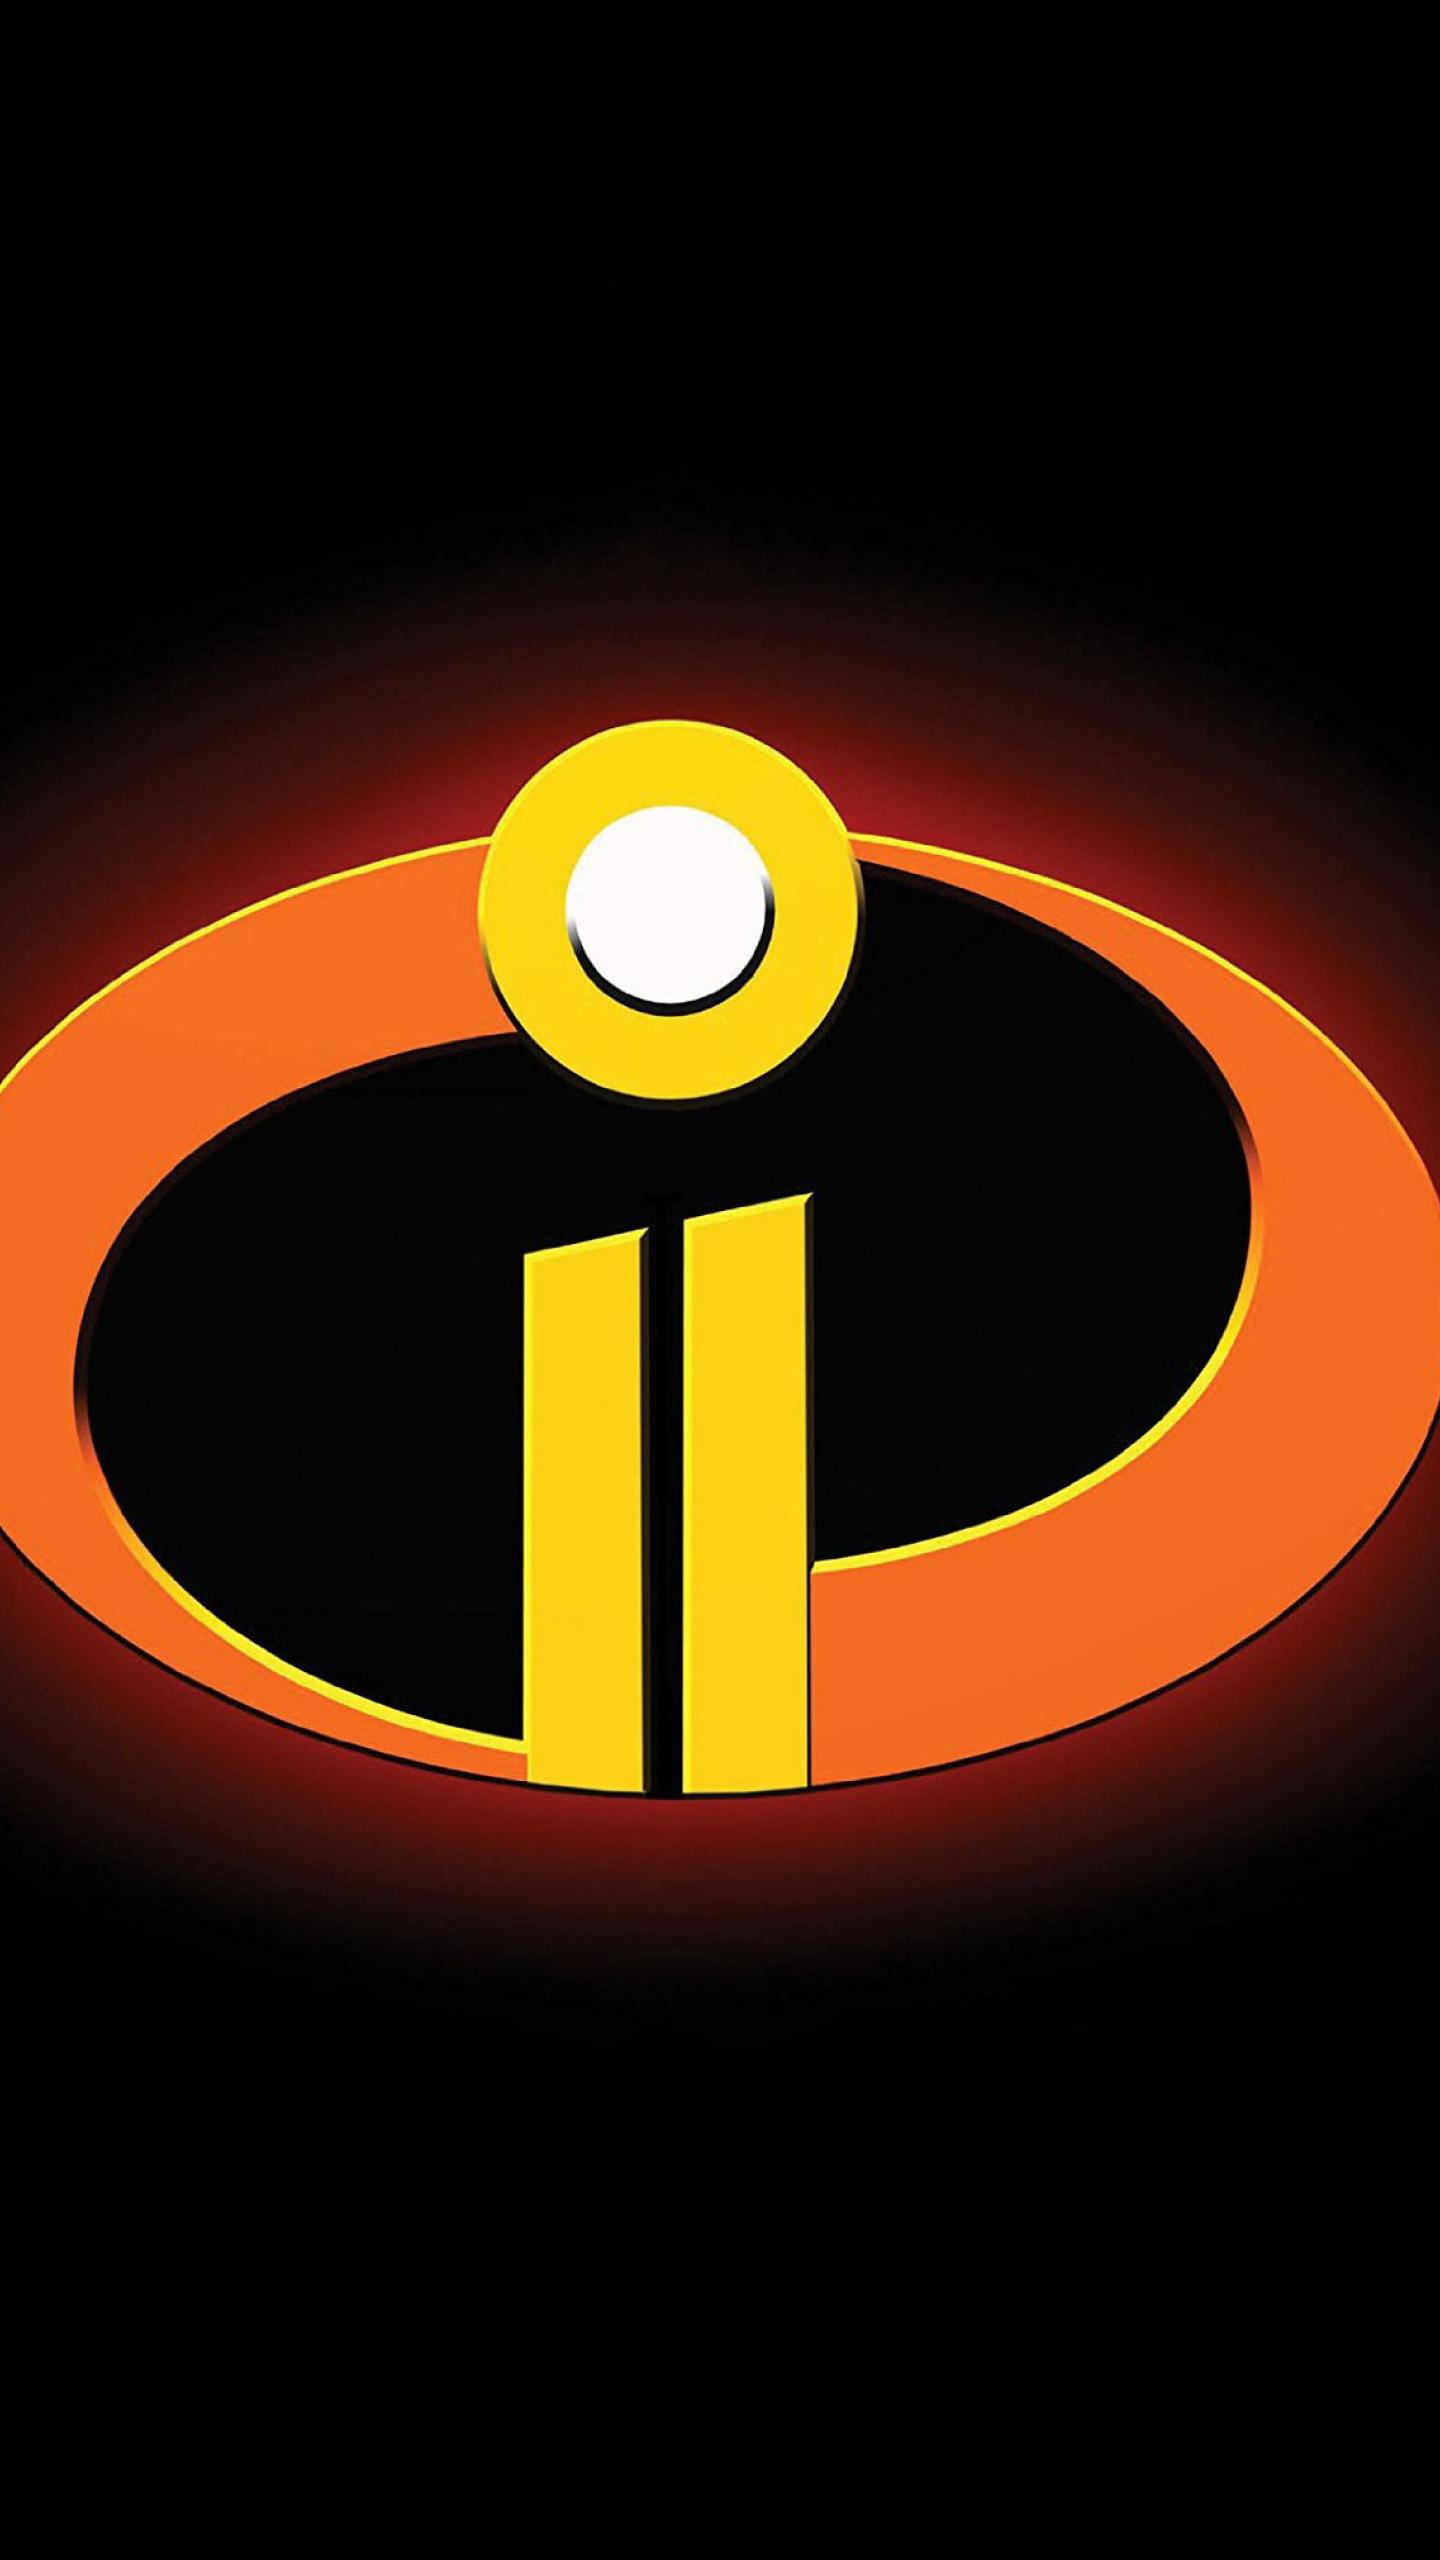 Xperia Z2 Vs Note 3 The Incredibles 2 Logo...